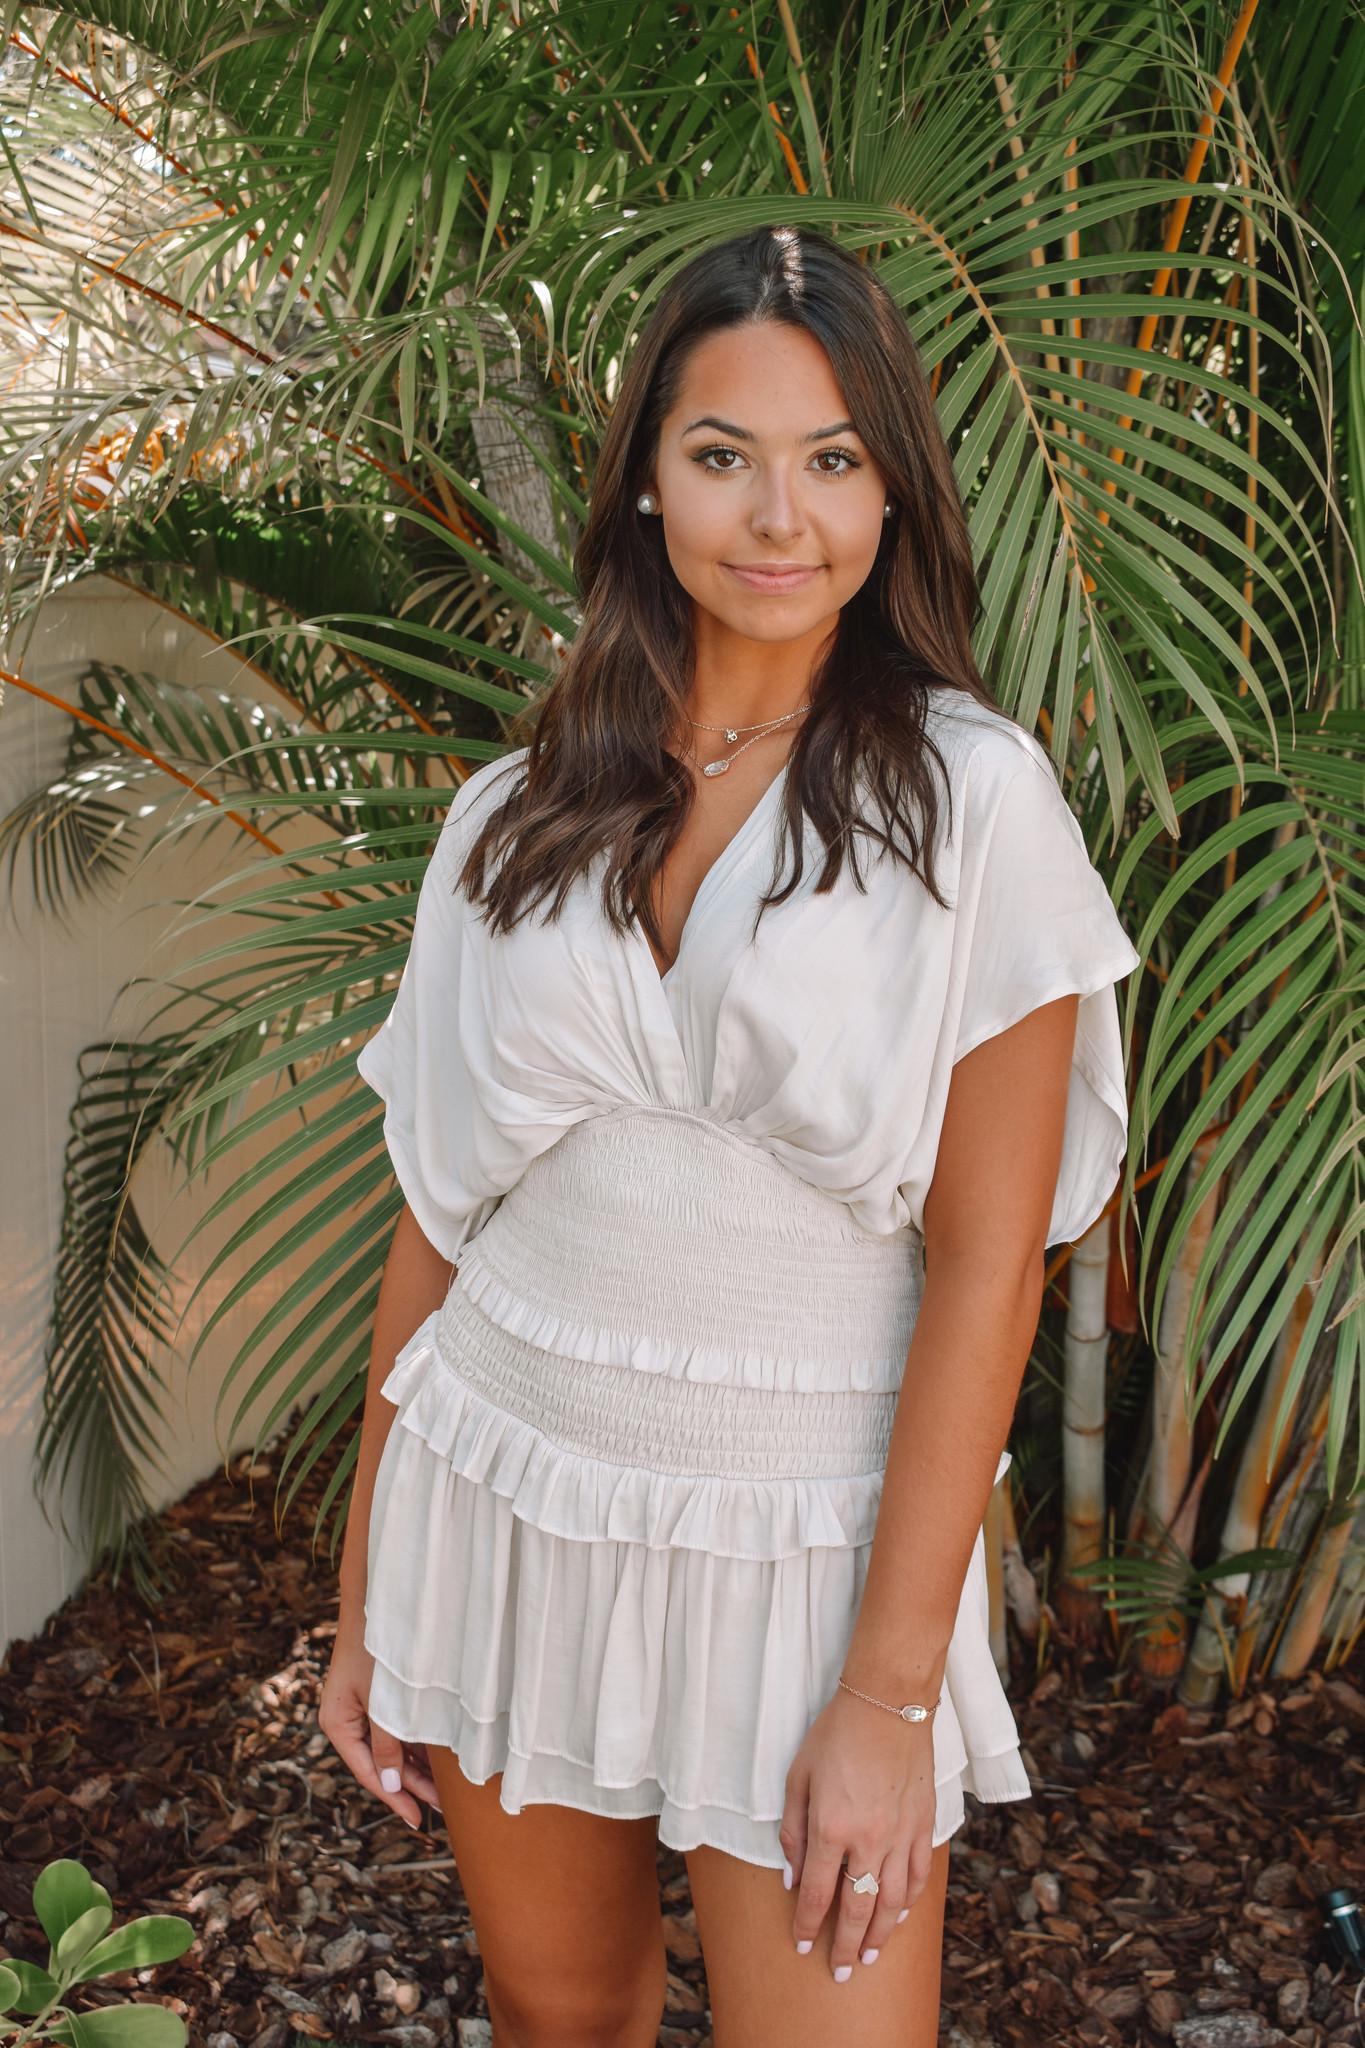 Michaela Smocked Ruffle Skirt